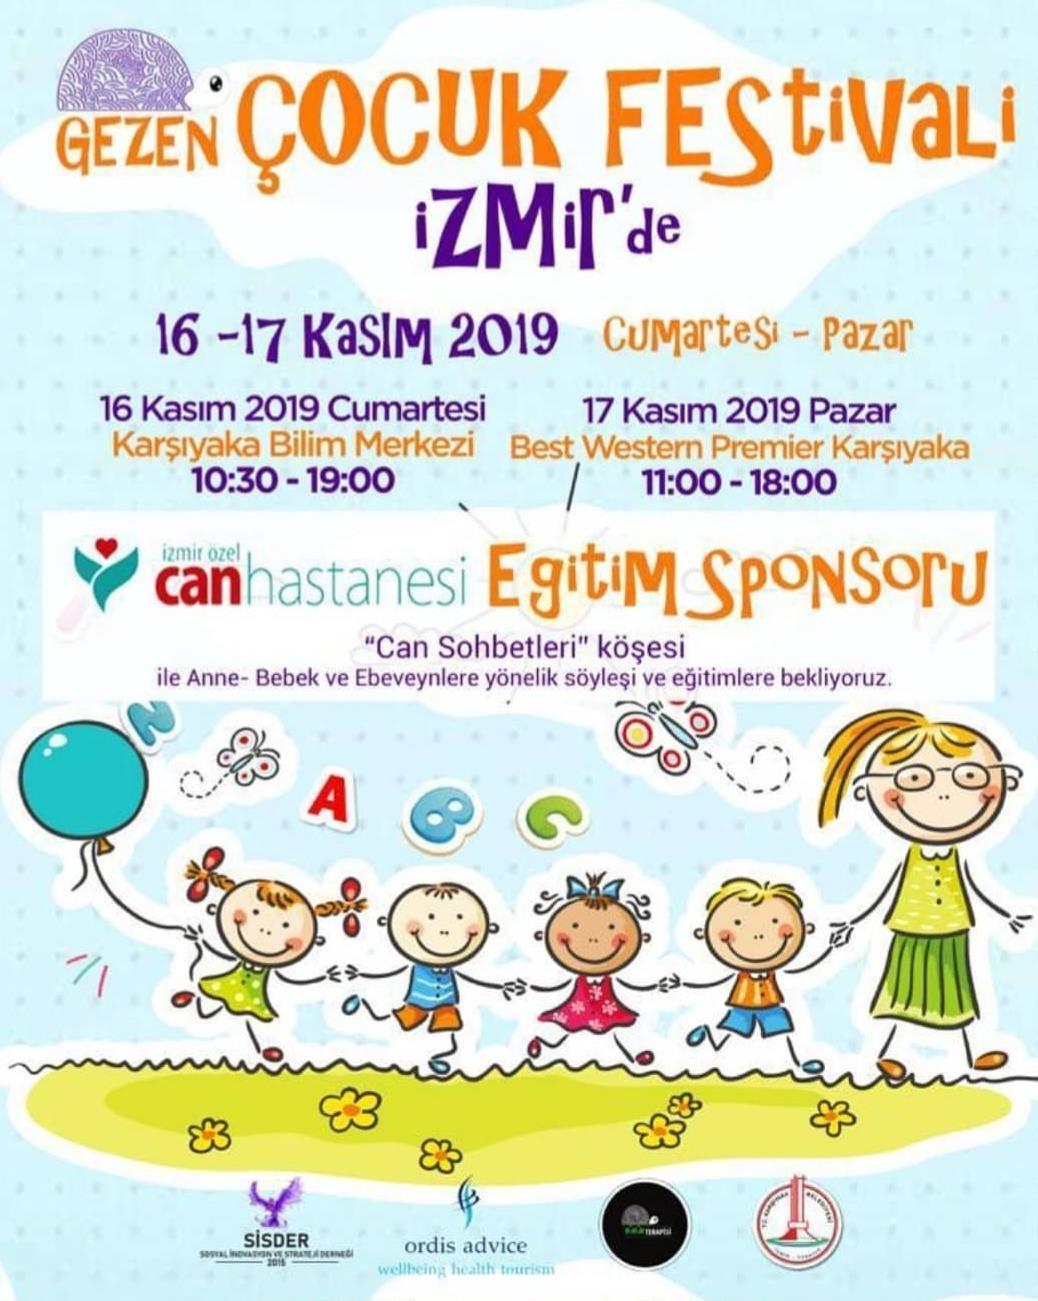 gezen-cocuk-festivali2020227145644381